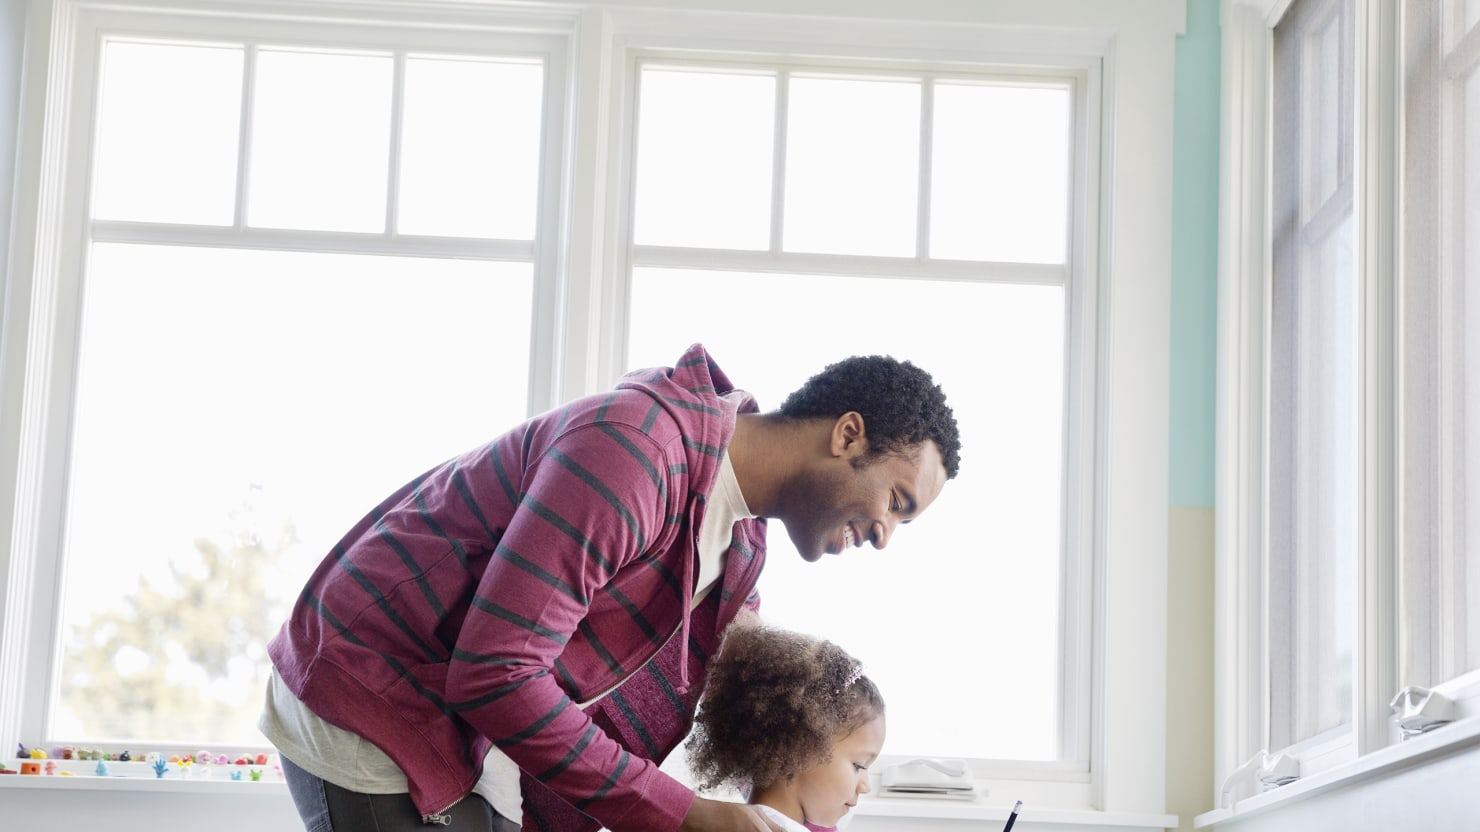 Millennial males seek work-life balance too